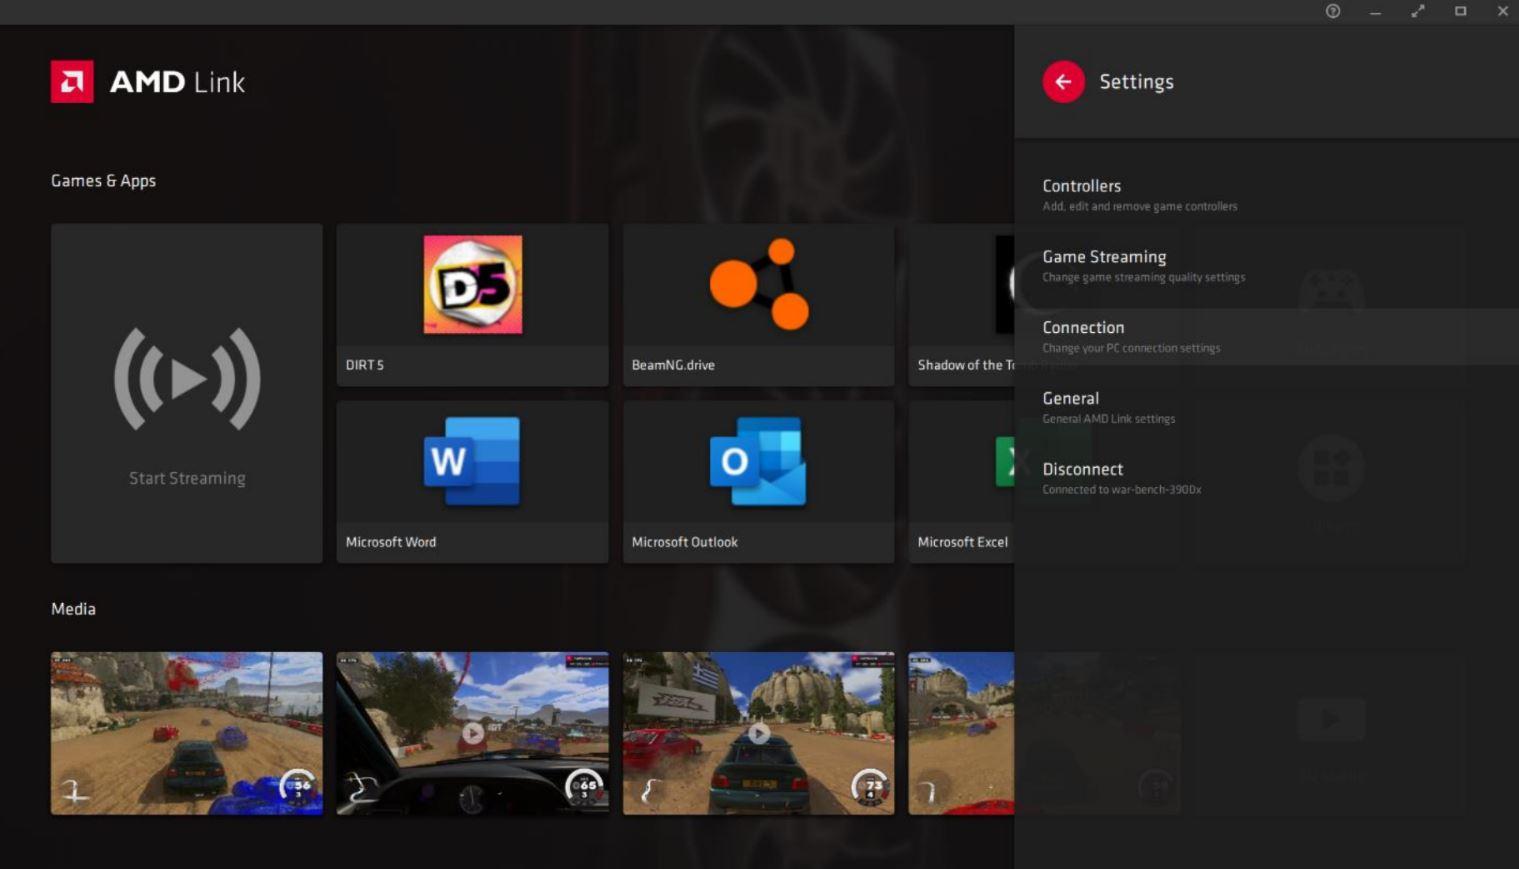 AMD Radeon Software Adrenalin 21.4.1, AMD LINK 9, GamersRD